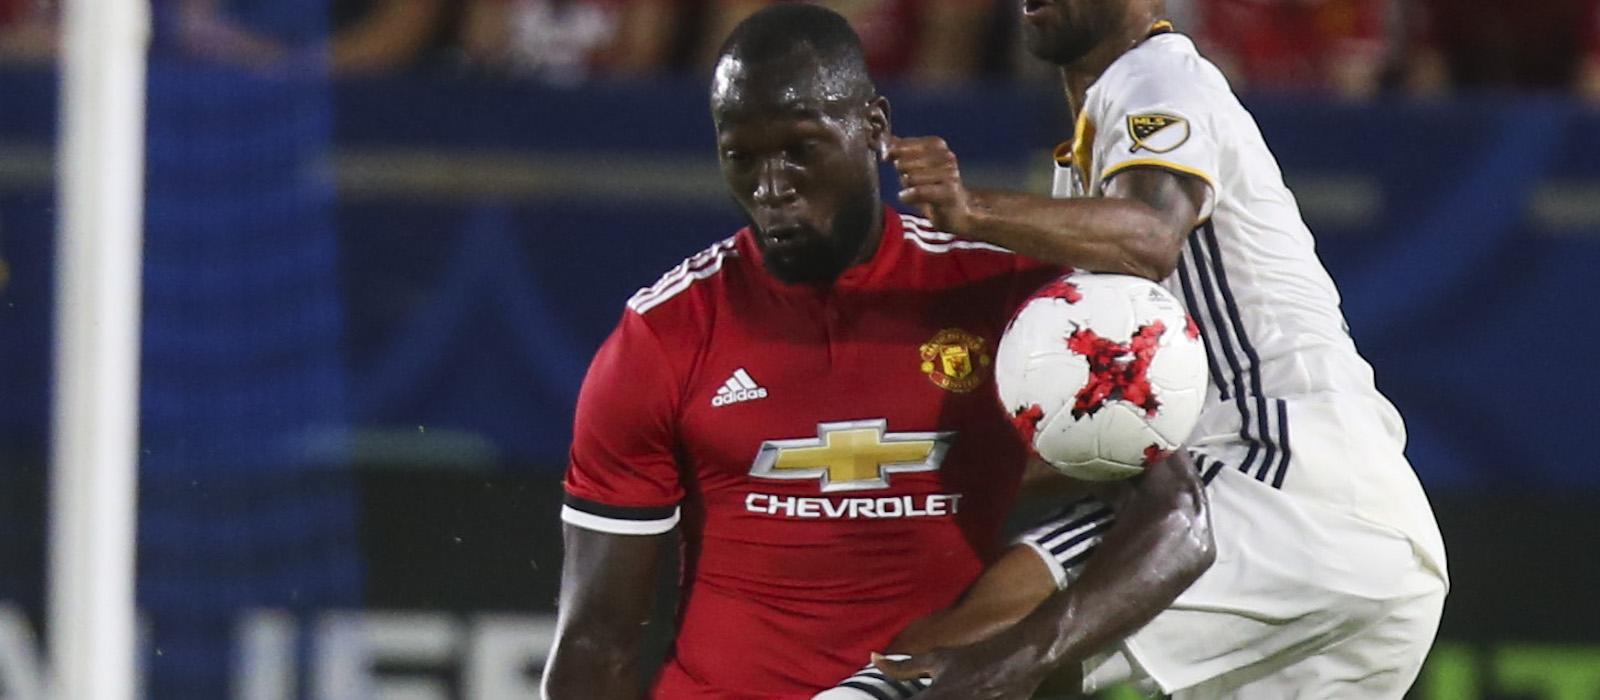 Manchester United fans react to Romelu Lukaku's debut against LA Galaxy